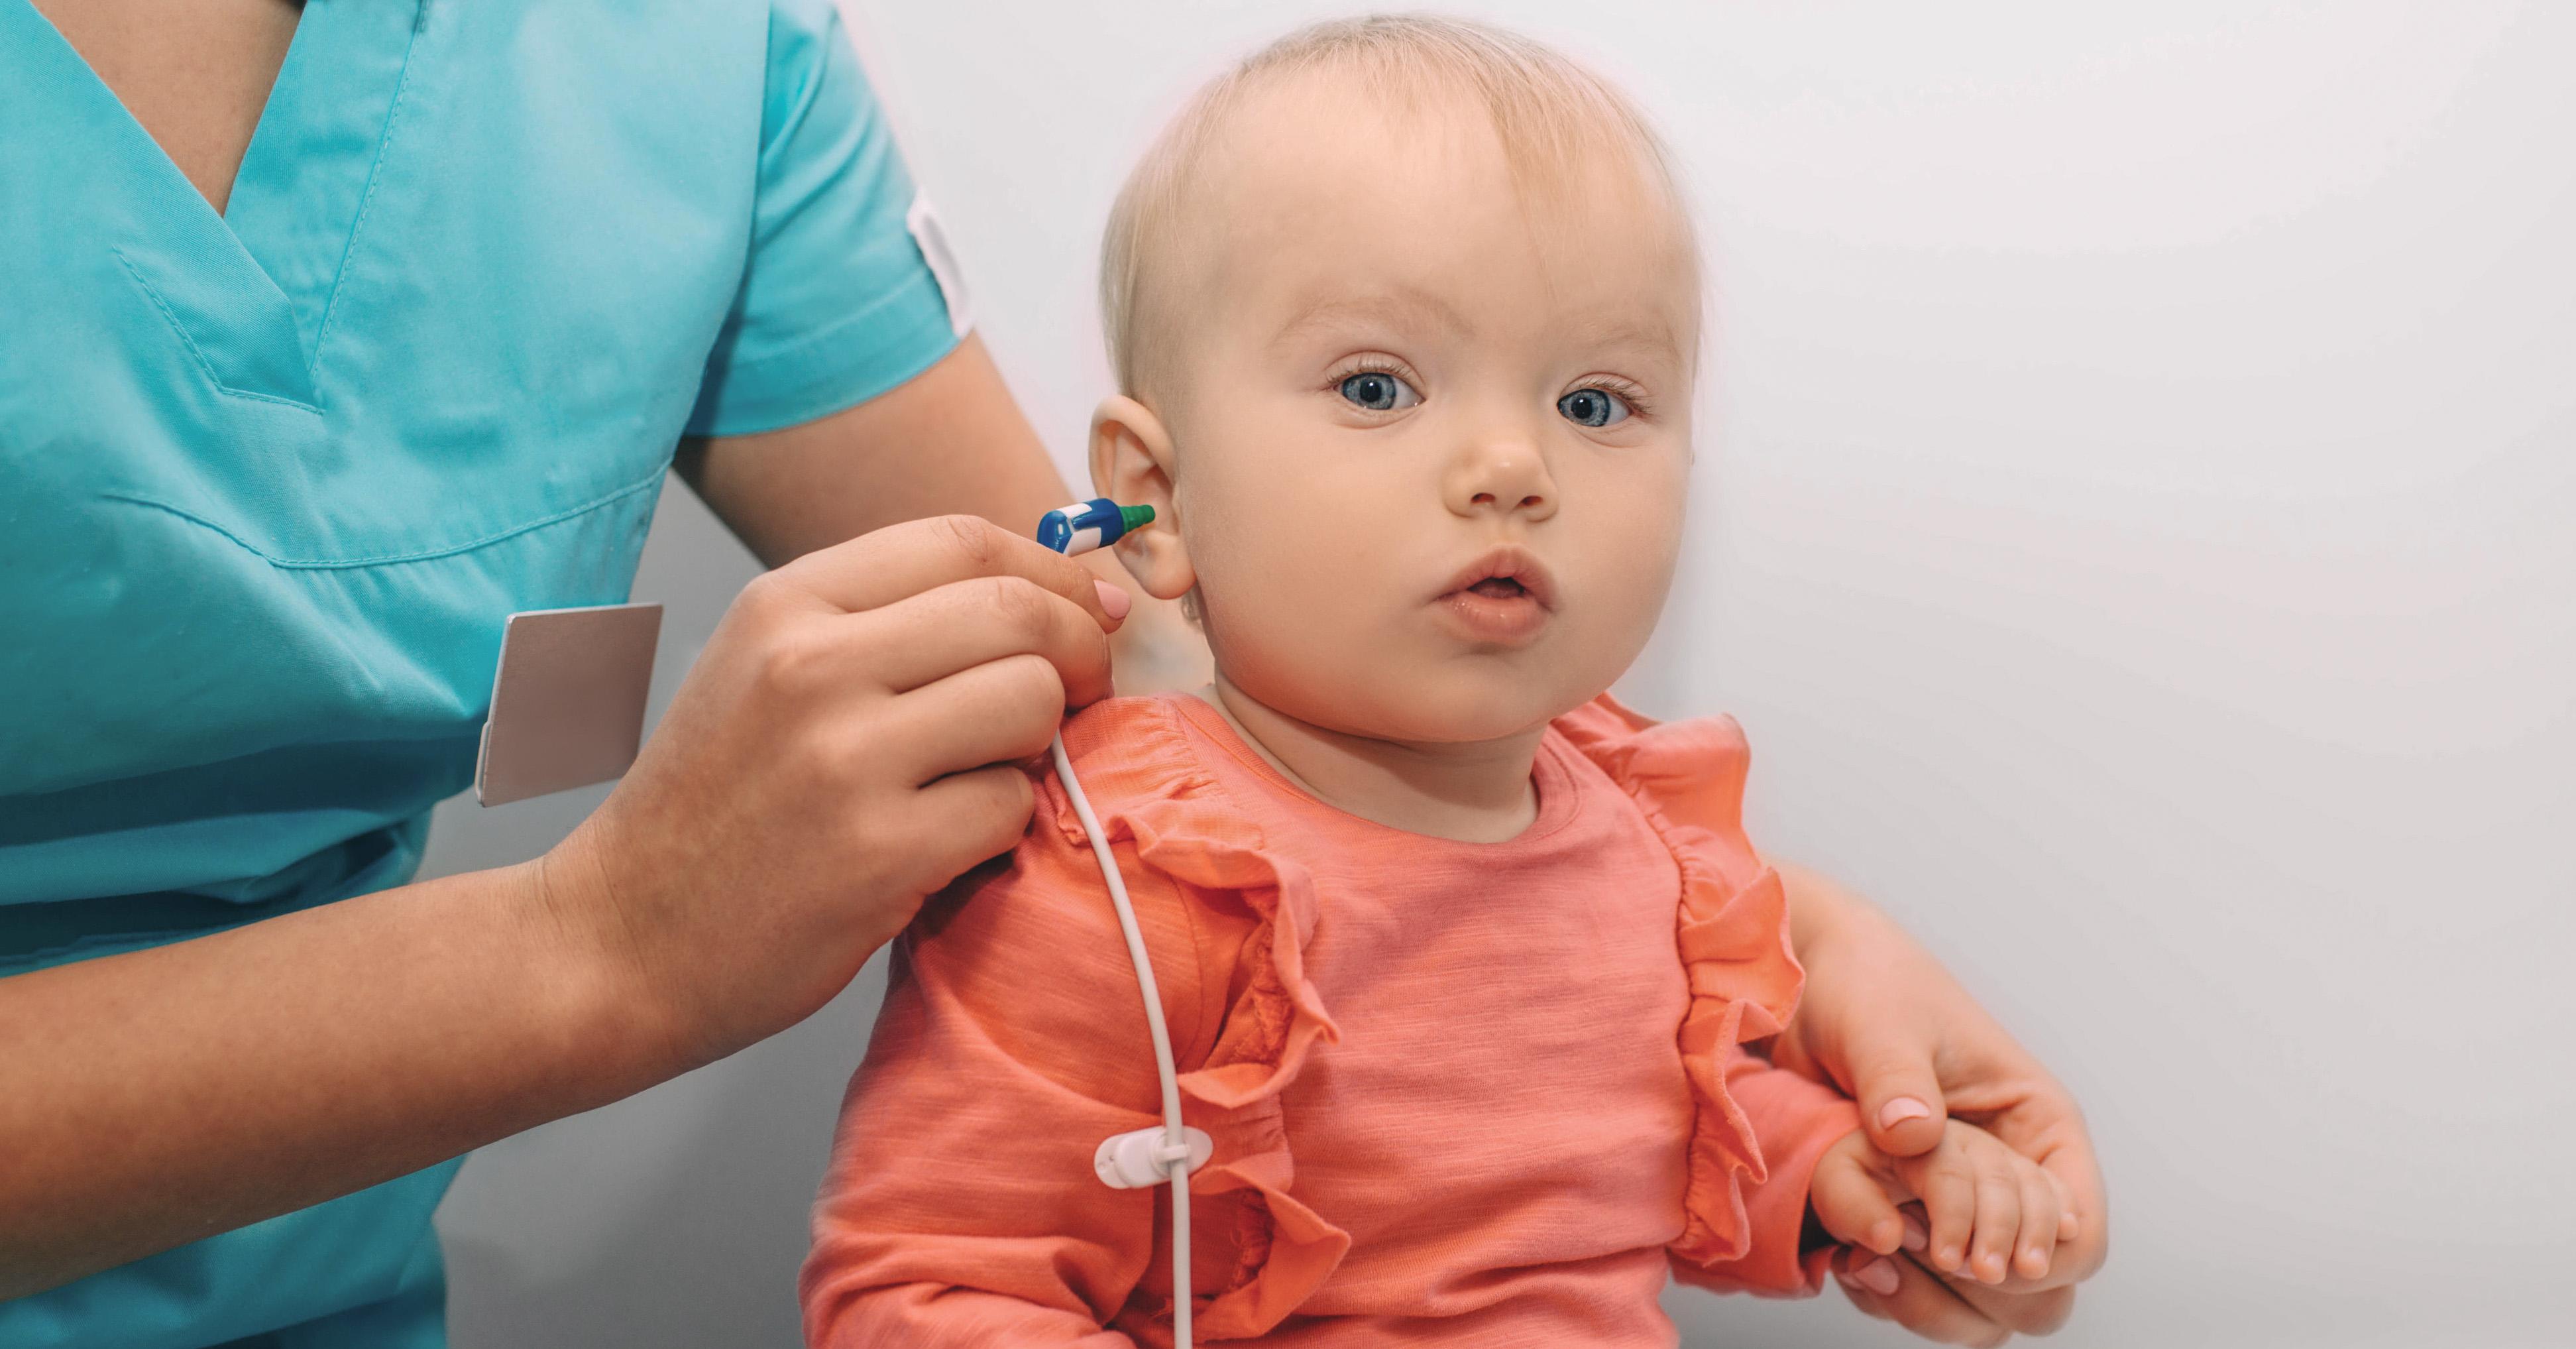 baby girl getting hearing screened